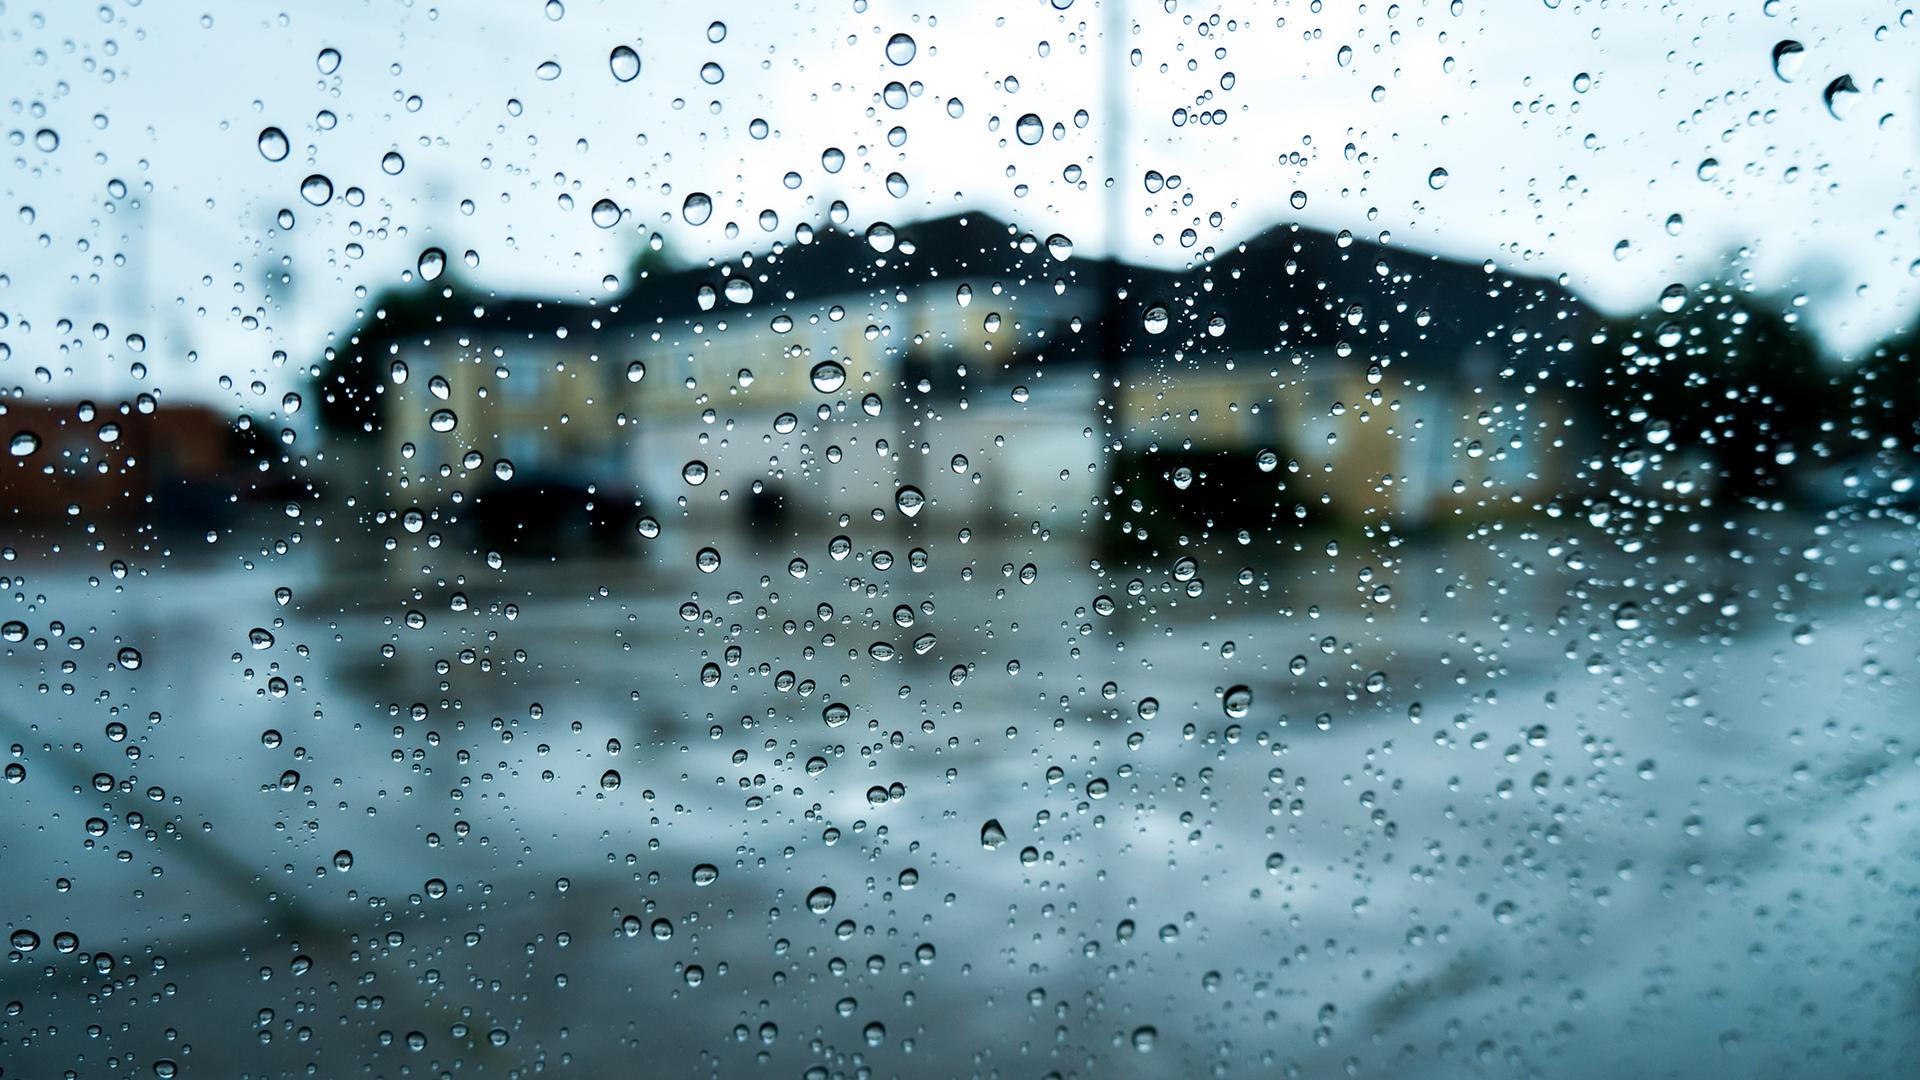 Hd wallpaper rain -  Download Rain Wallpaper Hd Download